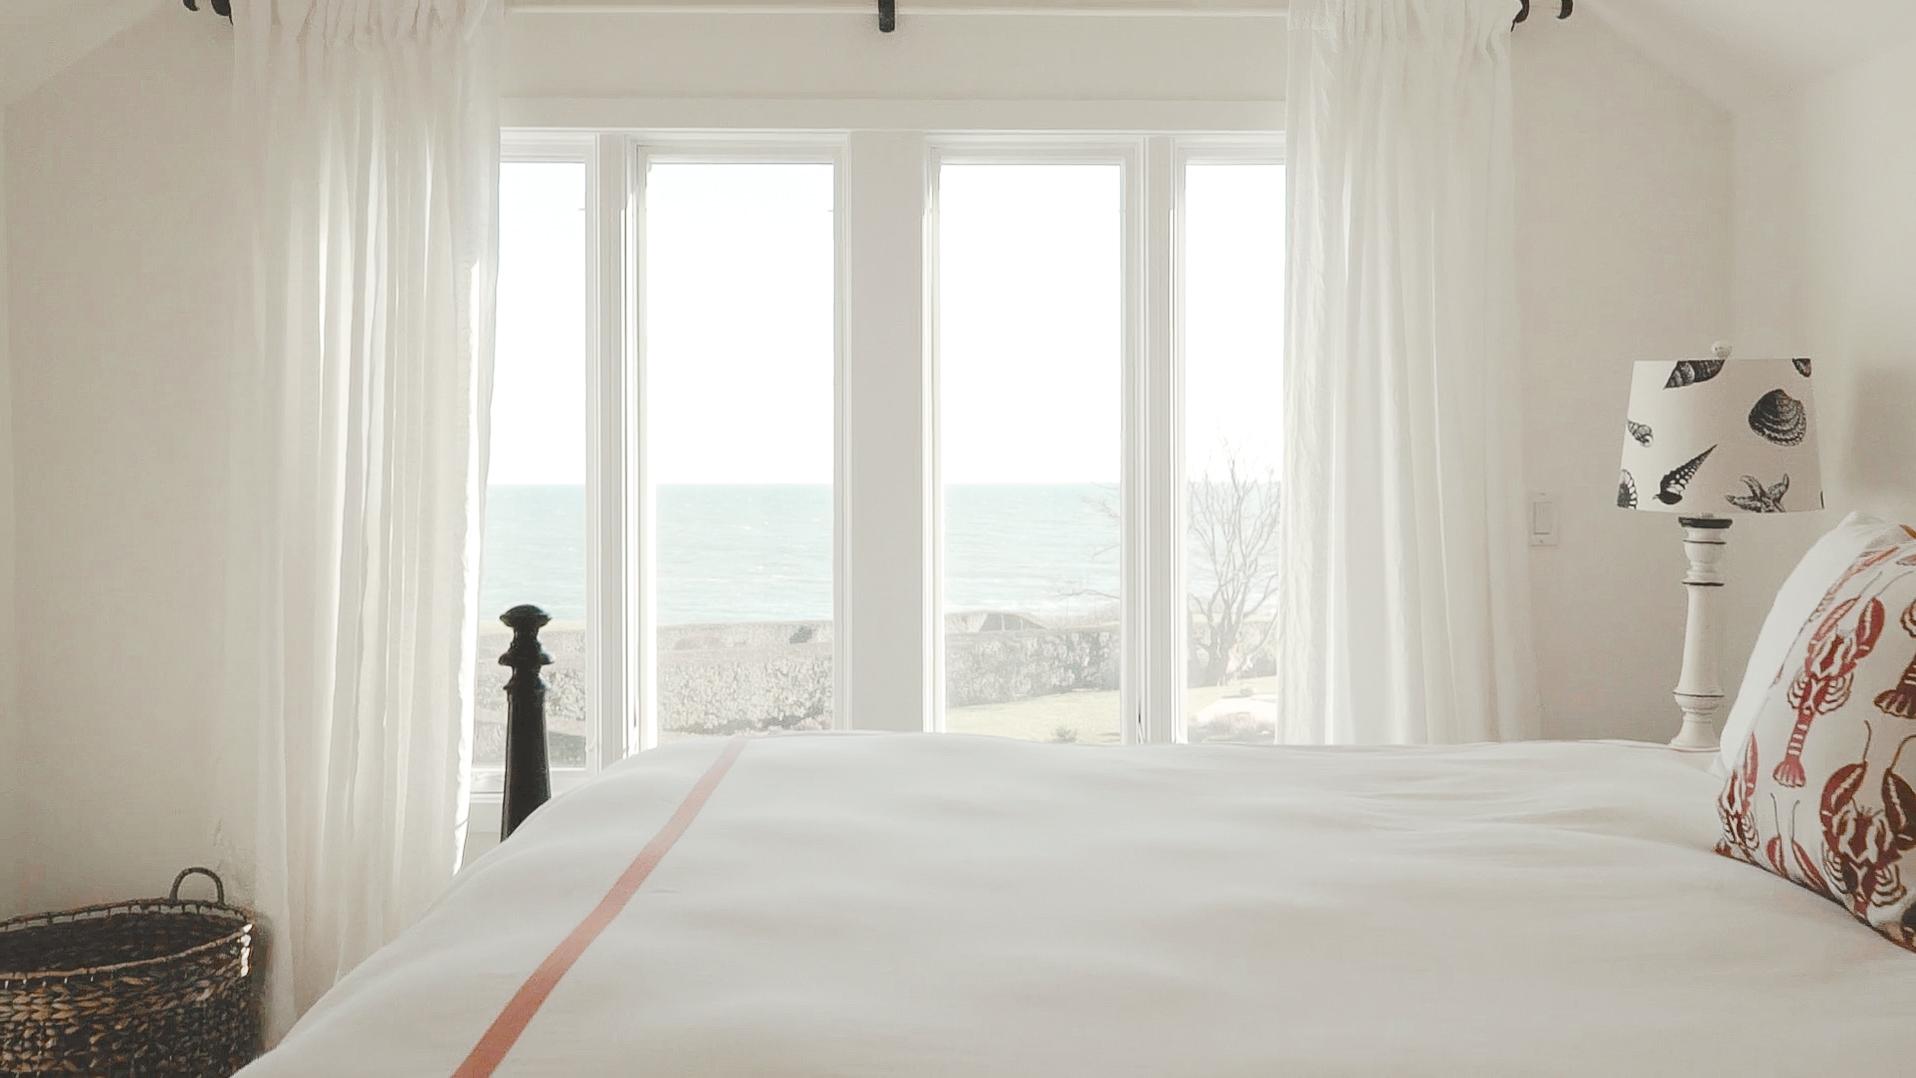 Luxe_and_Livable_Interior_Design_Blog_by_Maloney_Interiors_Newport_Rhode_Island_Lila_Delman_Real_Estate_14.jpg